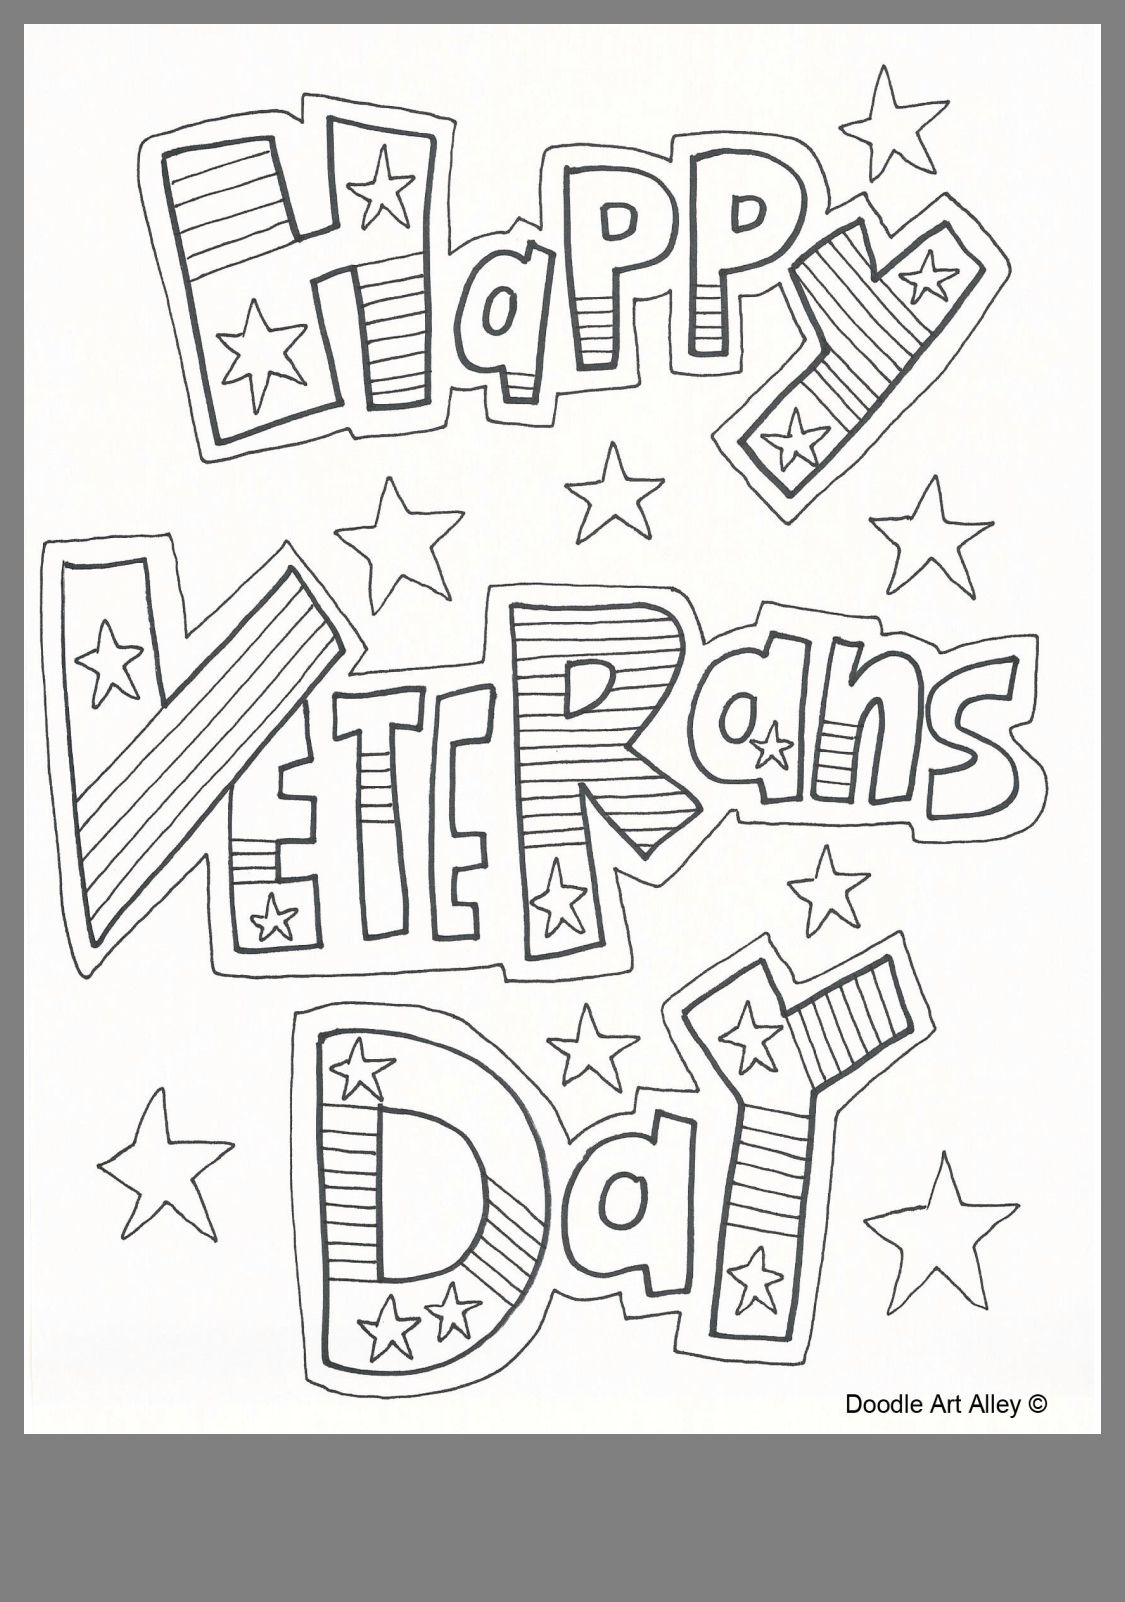 Pin By Lara Mcgoldrick On Veterans Day Veterans Day Coloring Page Free Veterans Day Veterans Day For Kids [ 1602 x 1125 Pixel ]